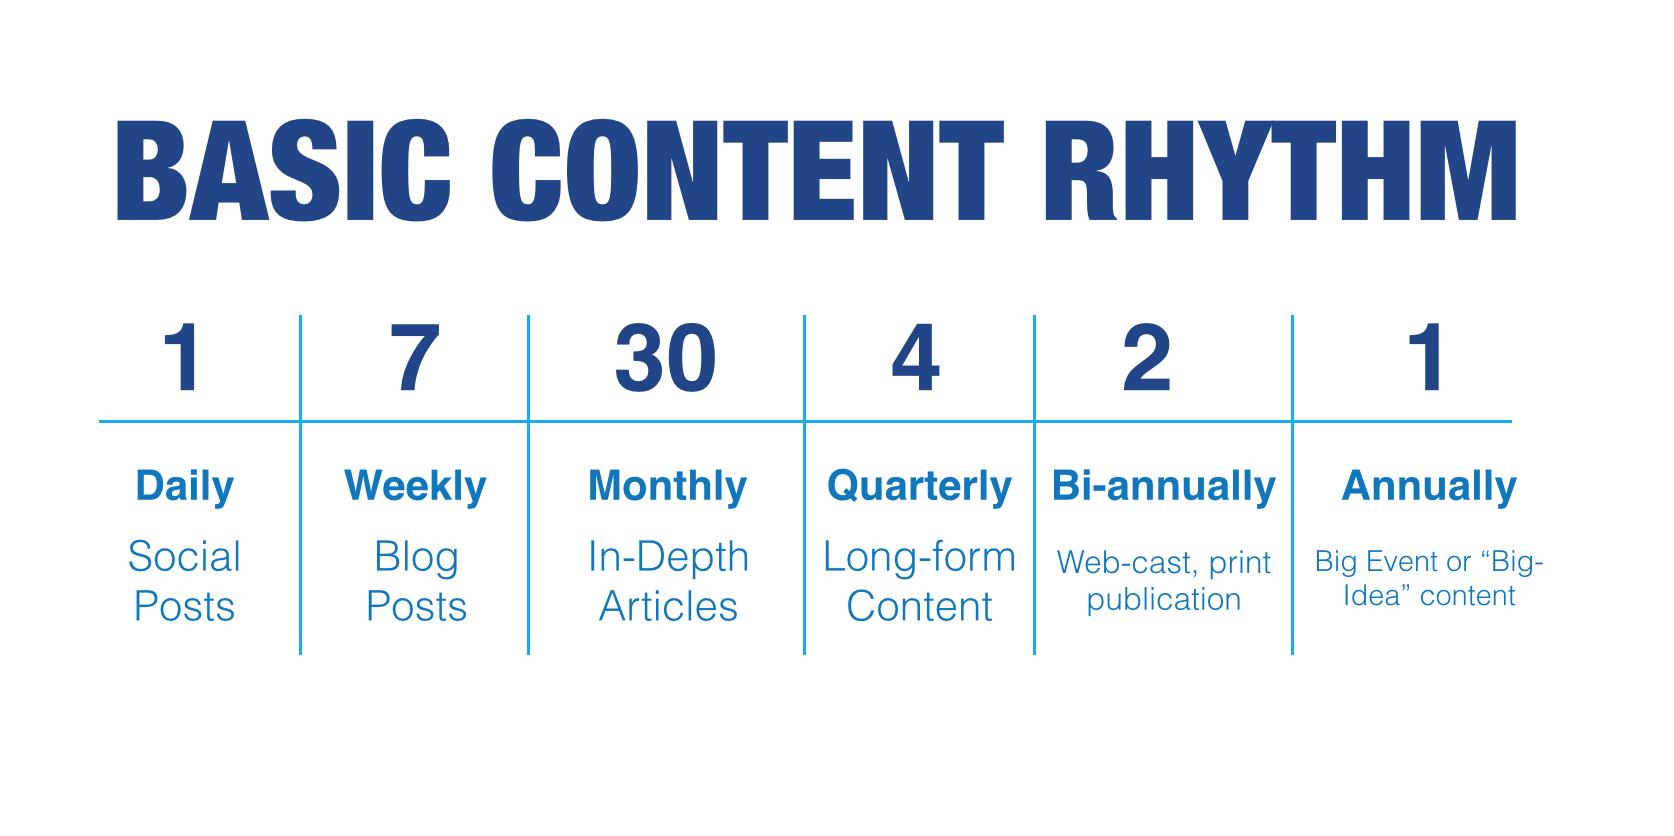 Basic Content Rhythm